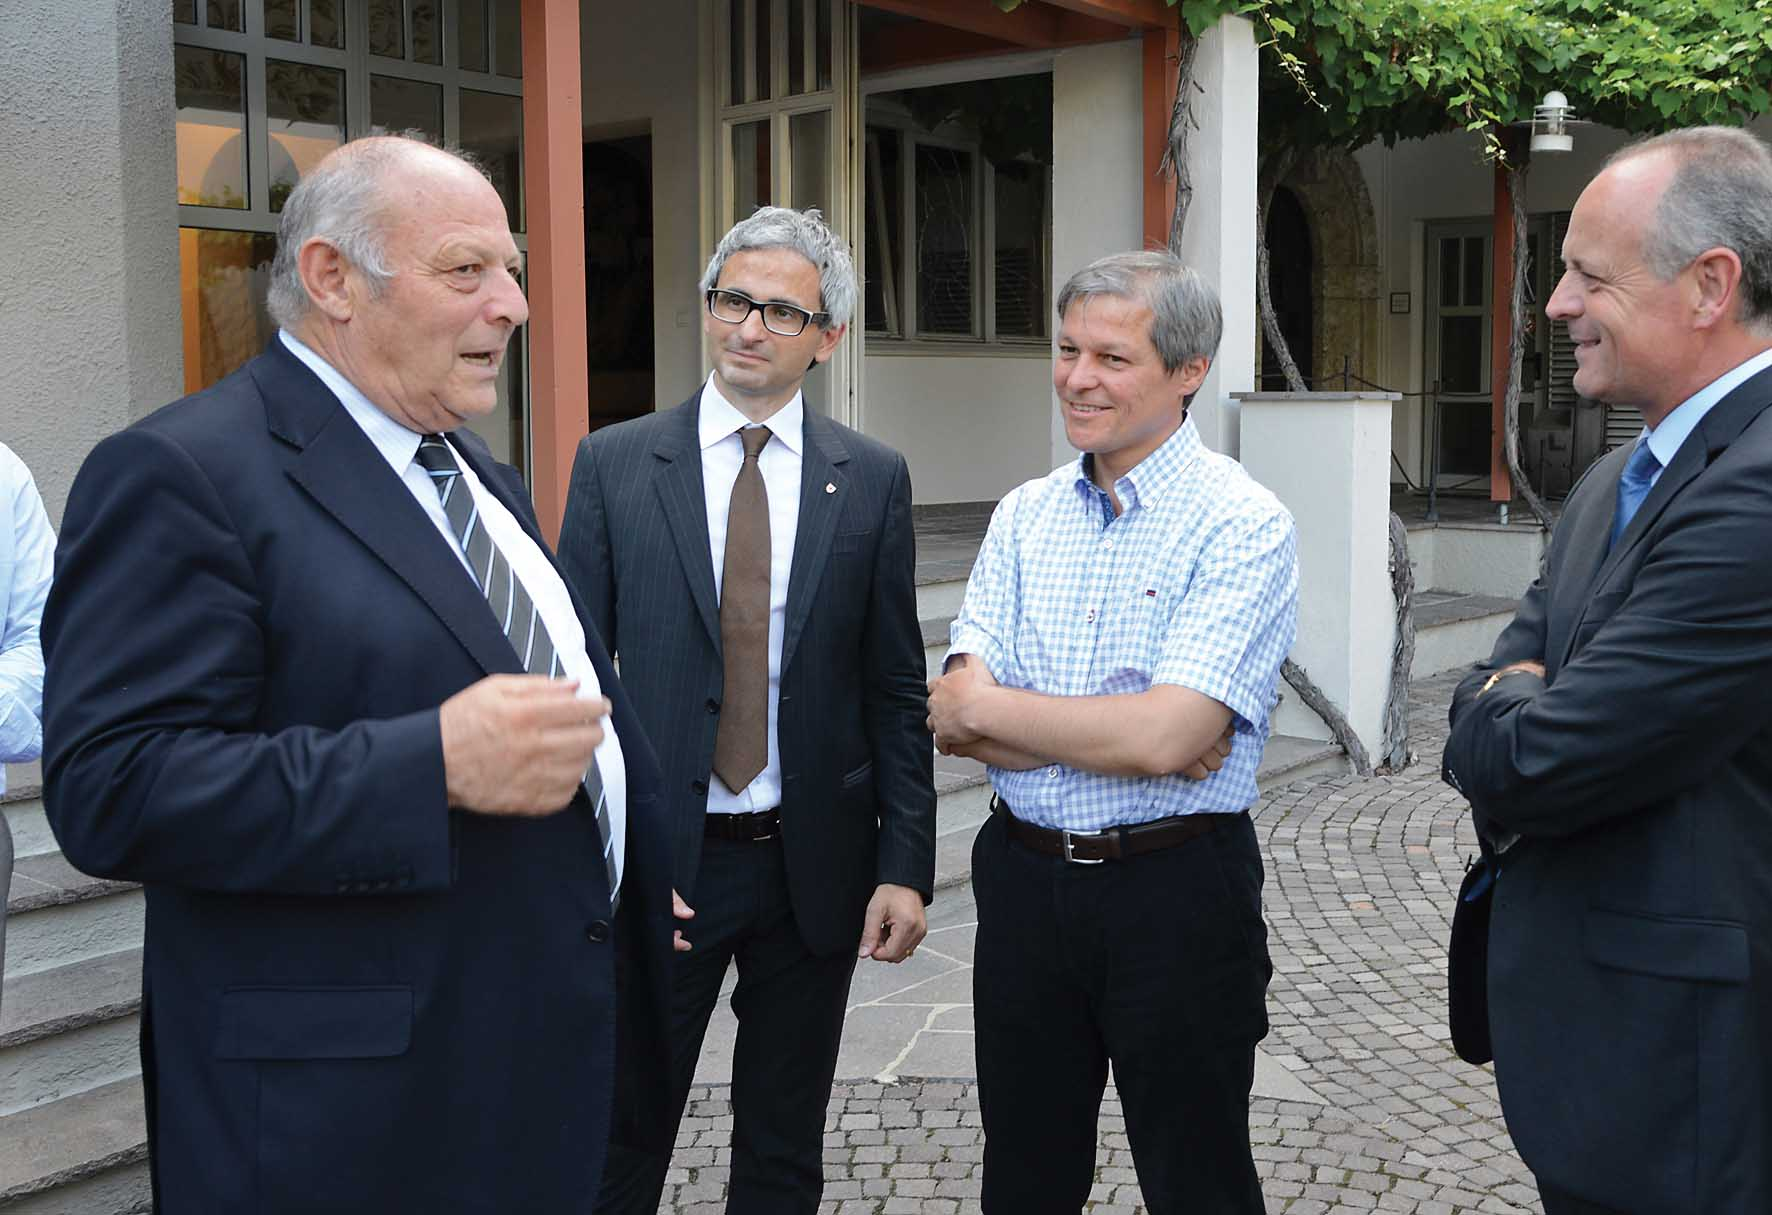 Da Sx Durnwalder Michael Oberhuber direttore Laimburg il commissario Dancian Ciolos e direttore Bauernbund Leo Tiefenthaler 1